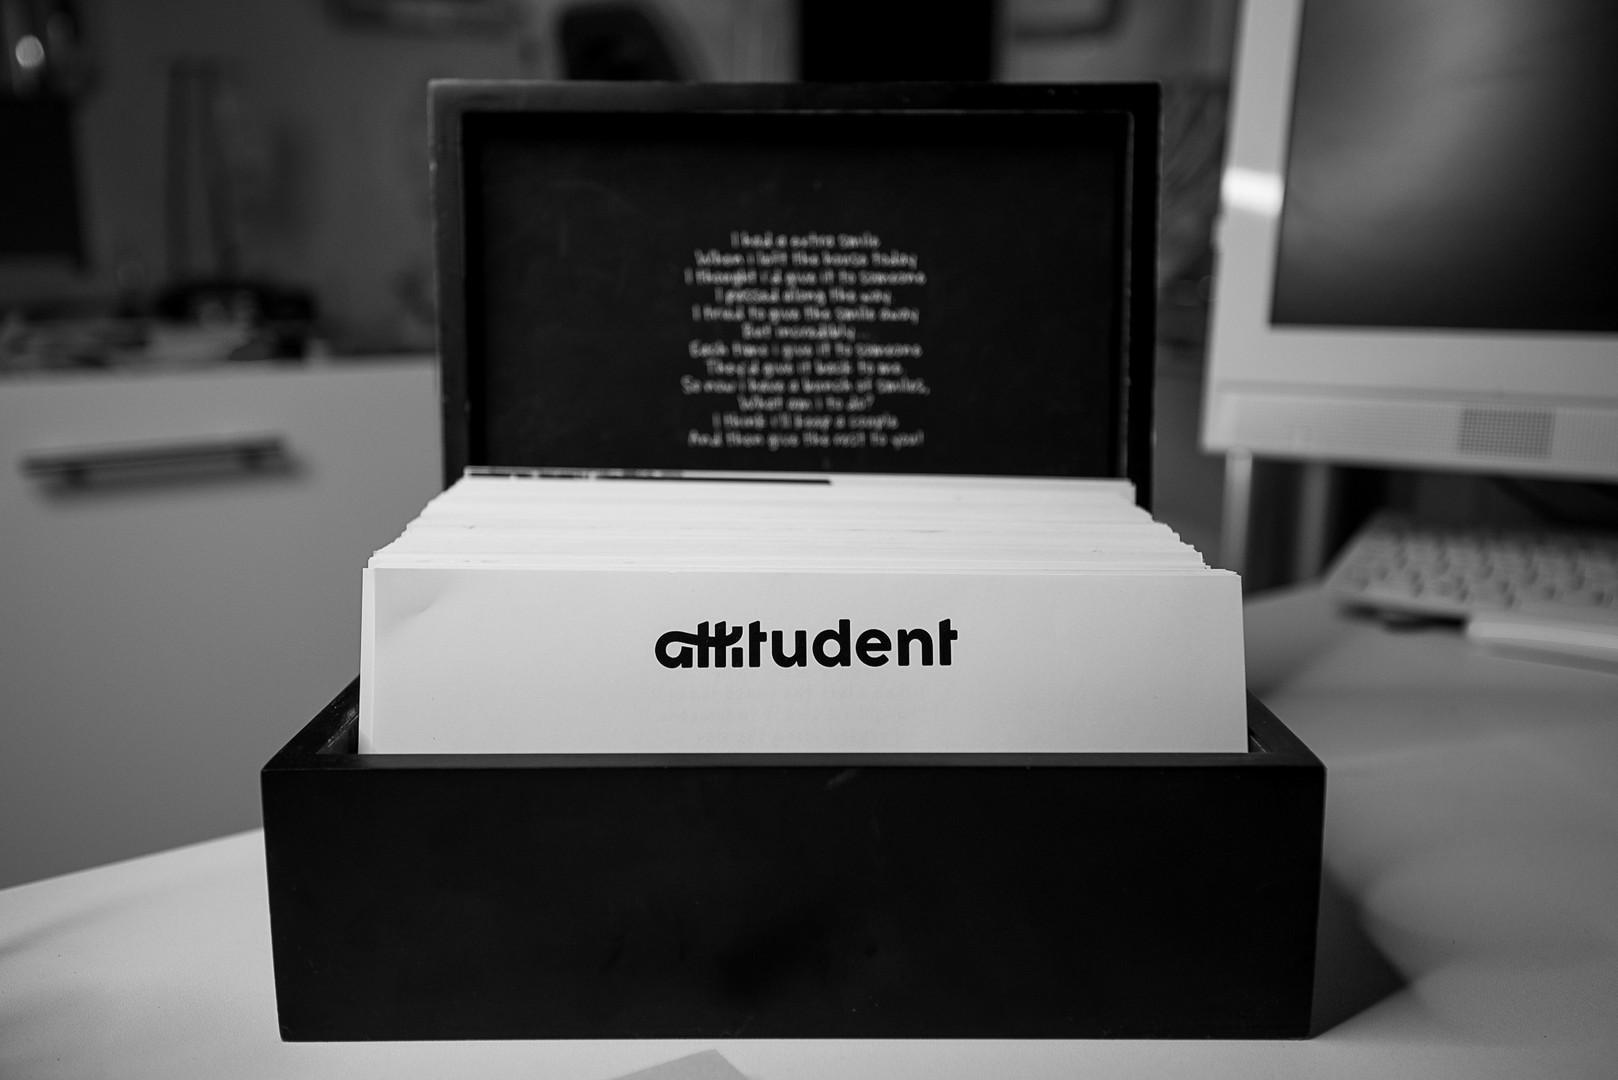 Atitudent-1058-0802_edited.jpg